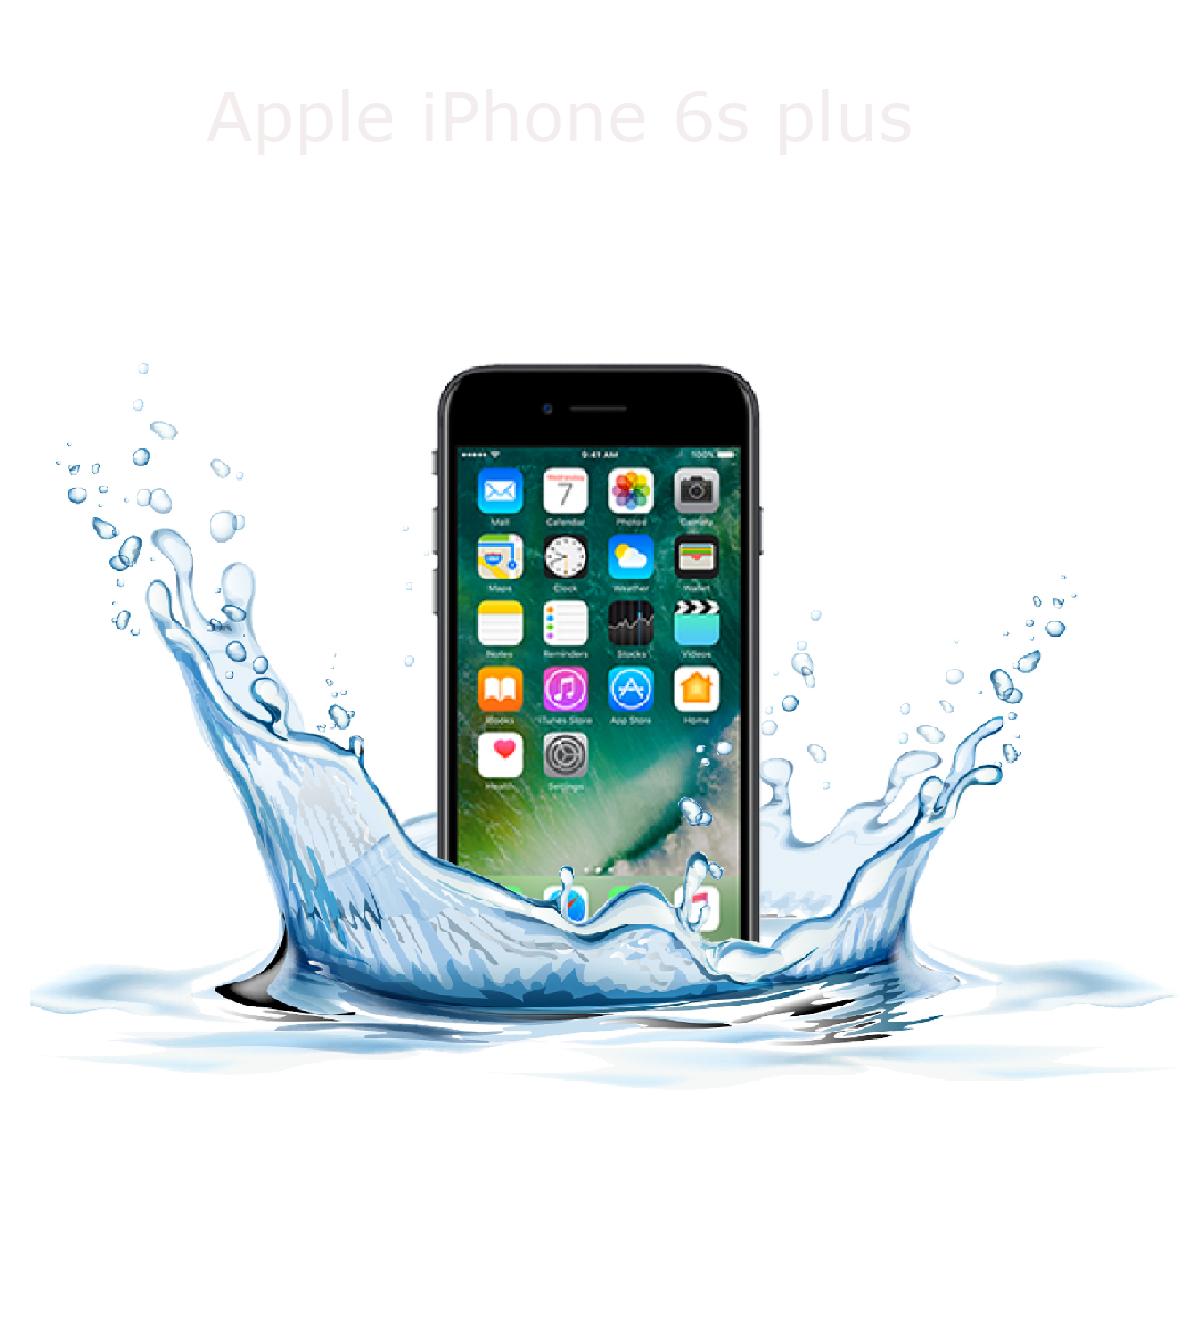 Laga fukt /vattenskadad iphone 6s plus